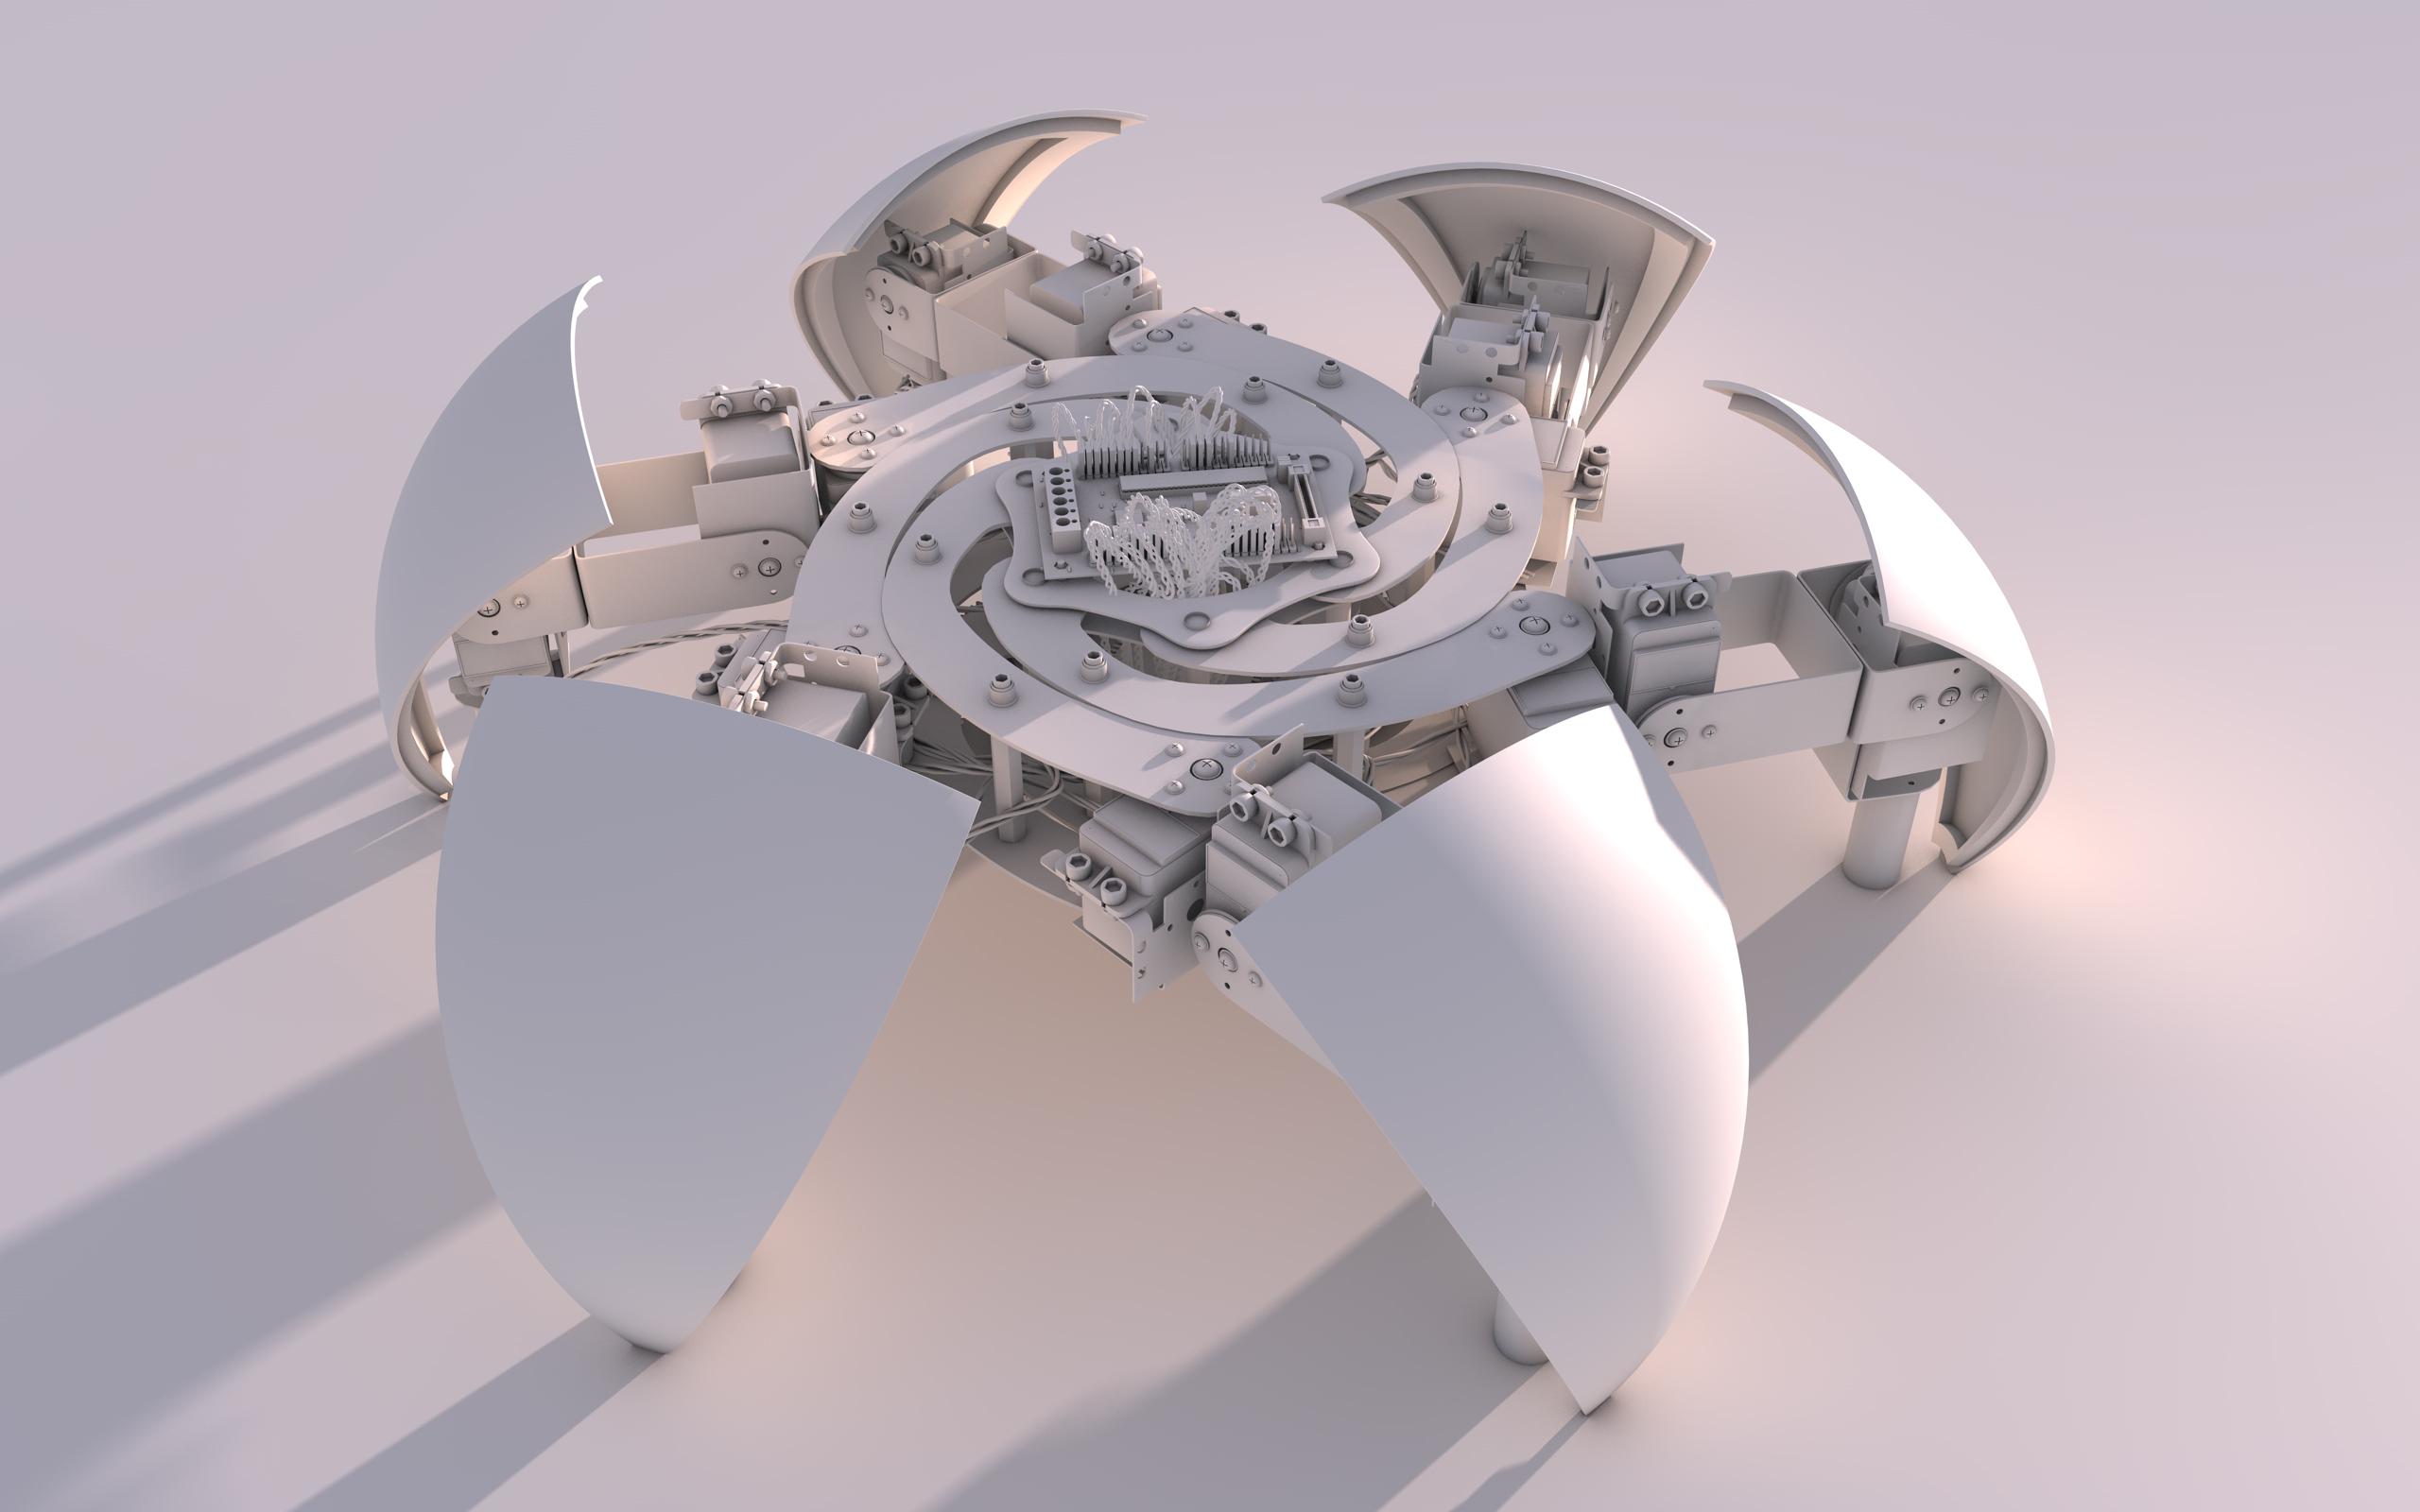 Robot sans texture